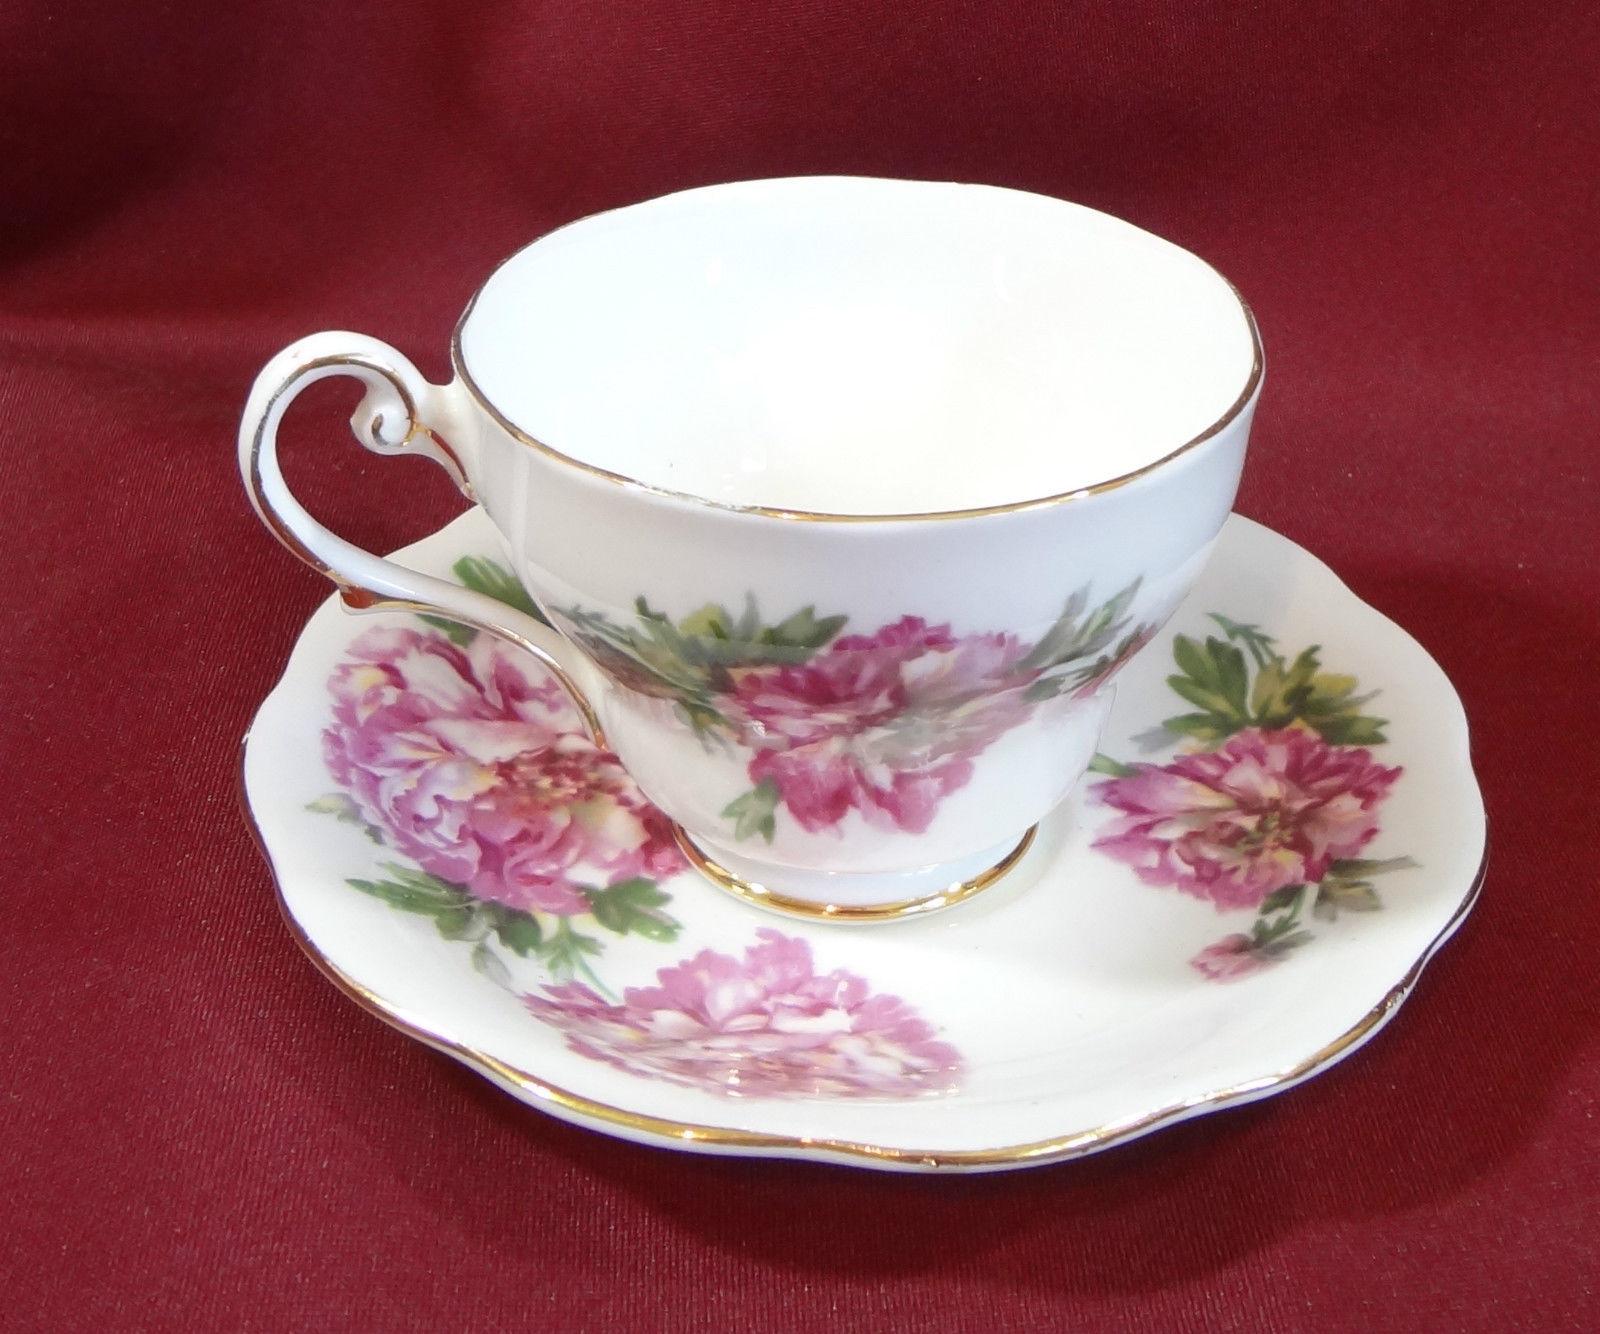 amethyst royal standard fine bone china tea cup saucer england peony gold trim royal standard. Black Bedroom Furniture Sets. Home Design Ideas